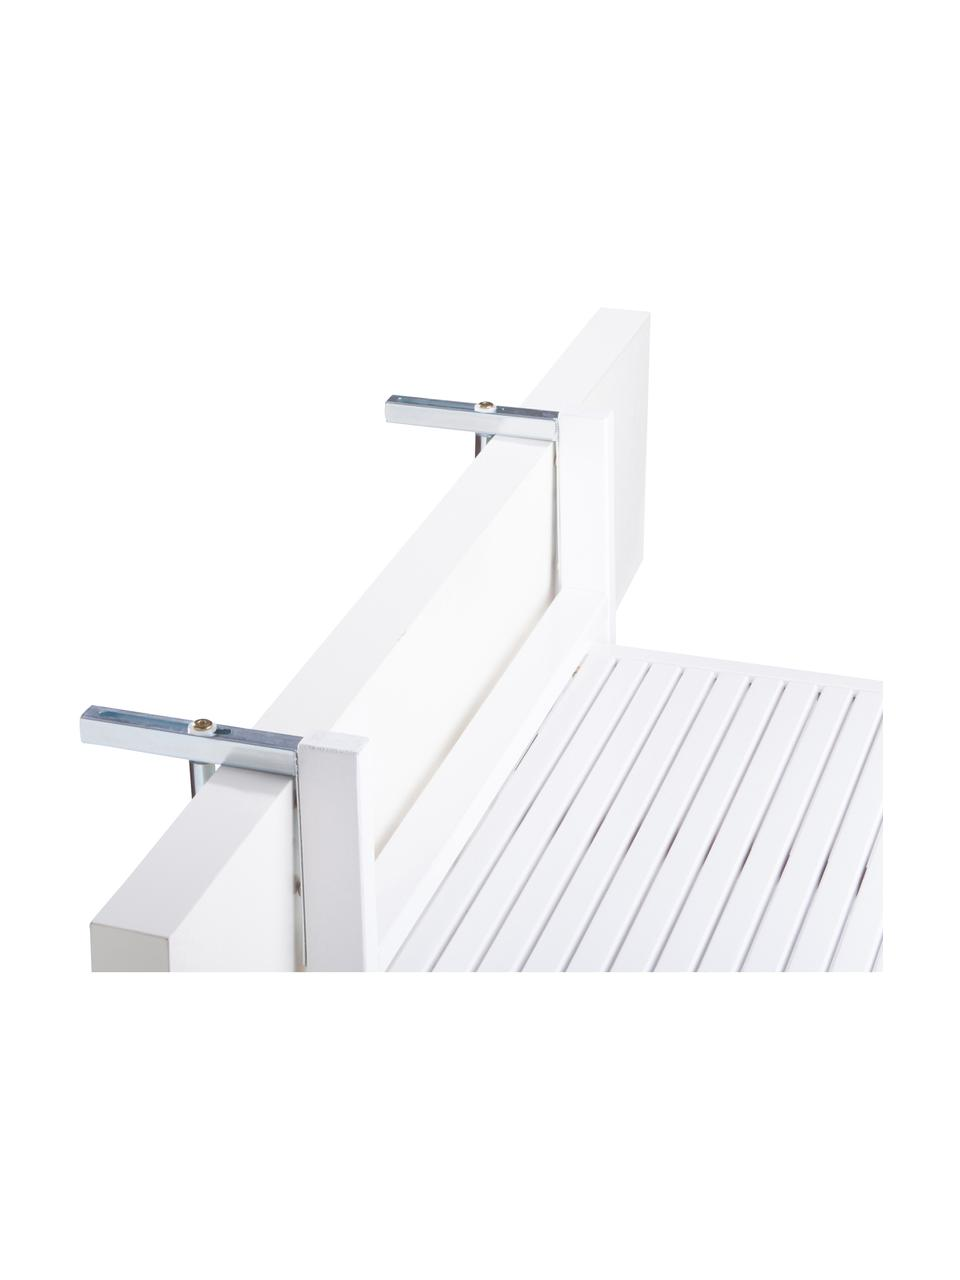 Table de balcon rabattable en bois Lodge, Blanc